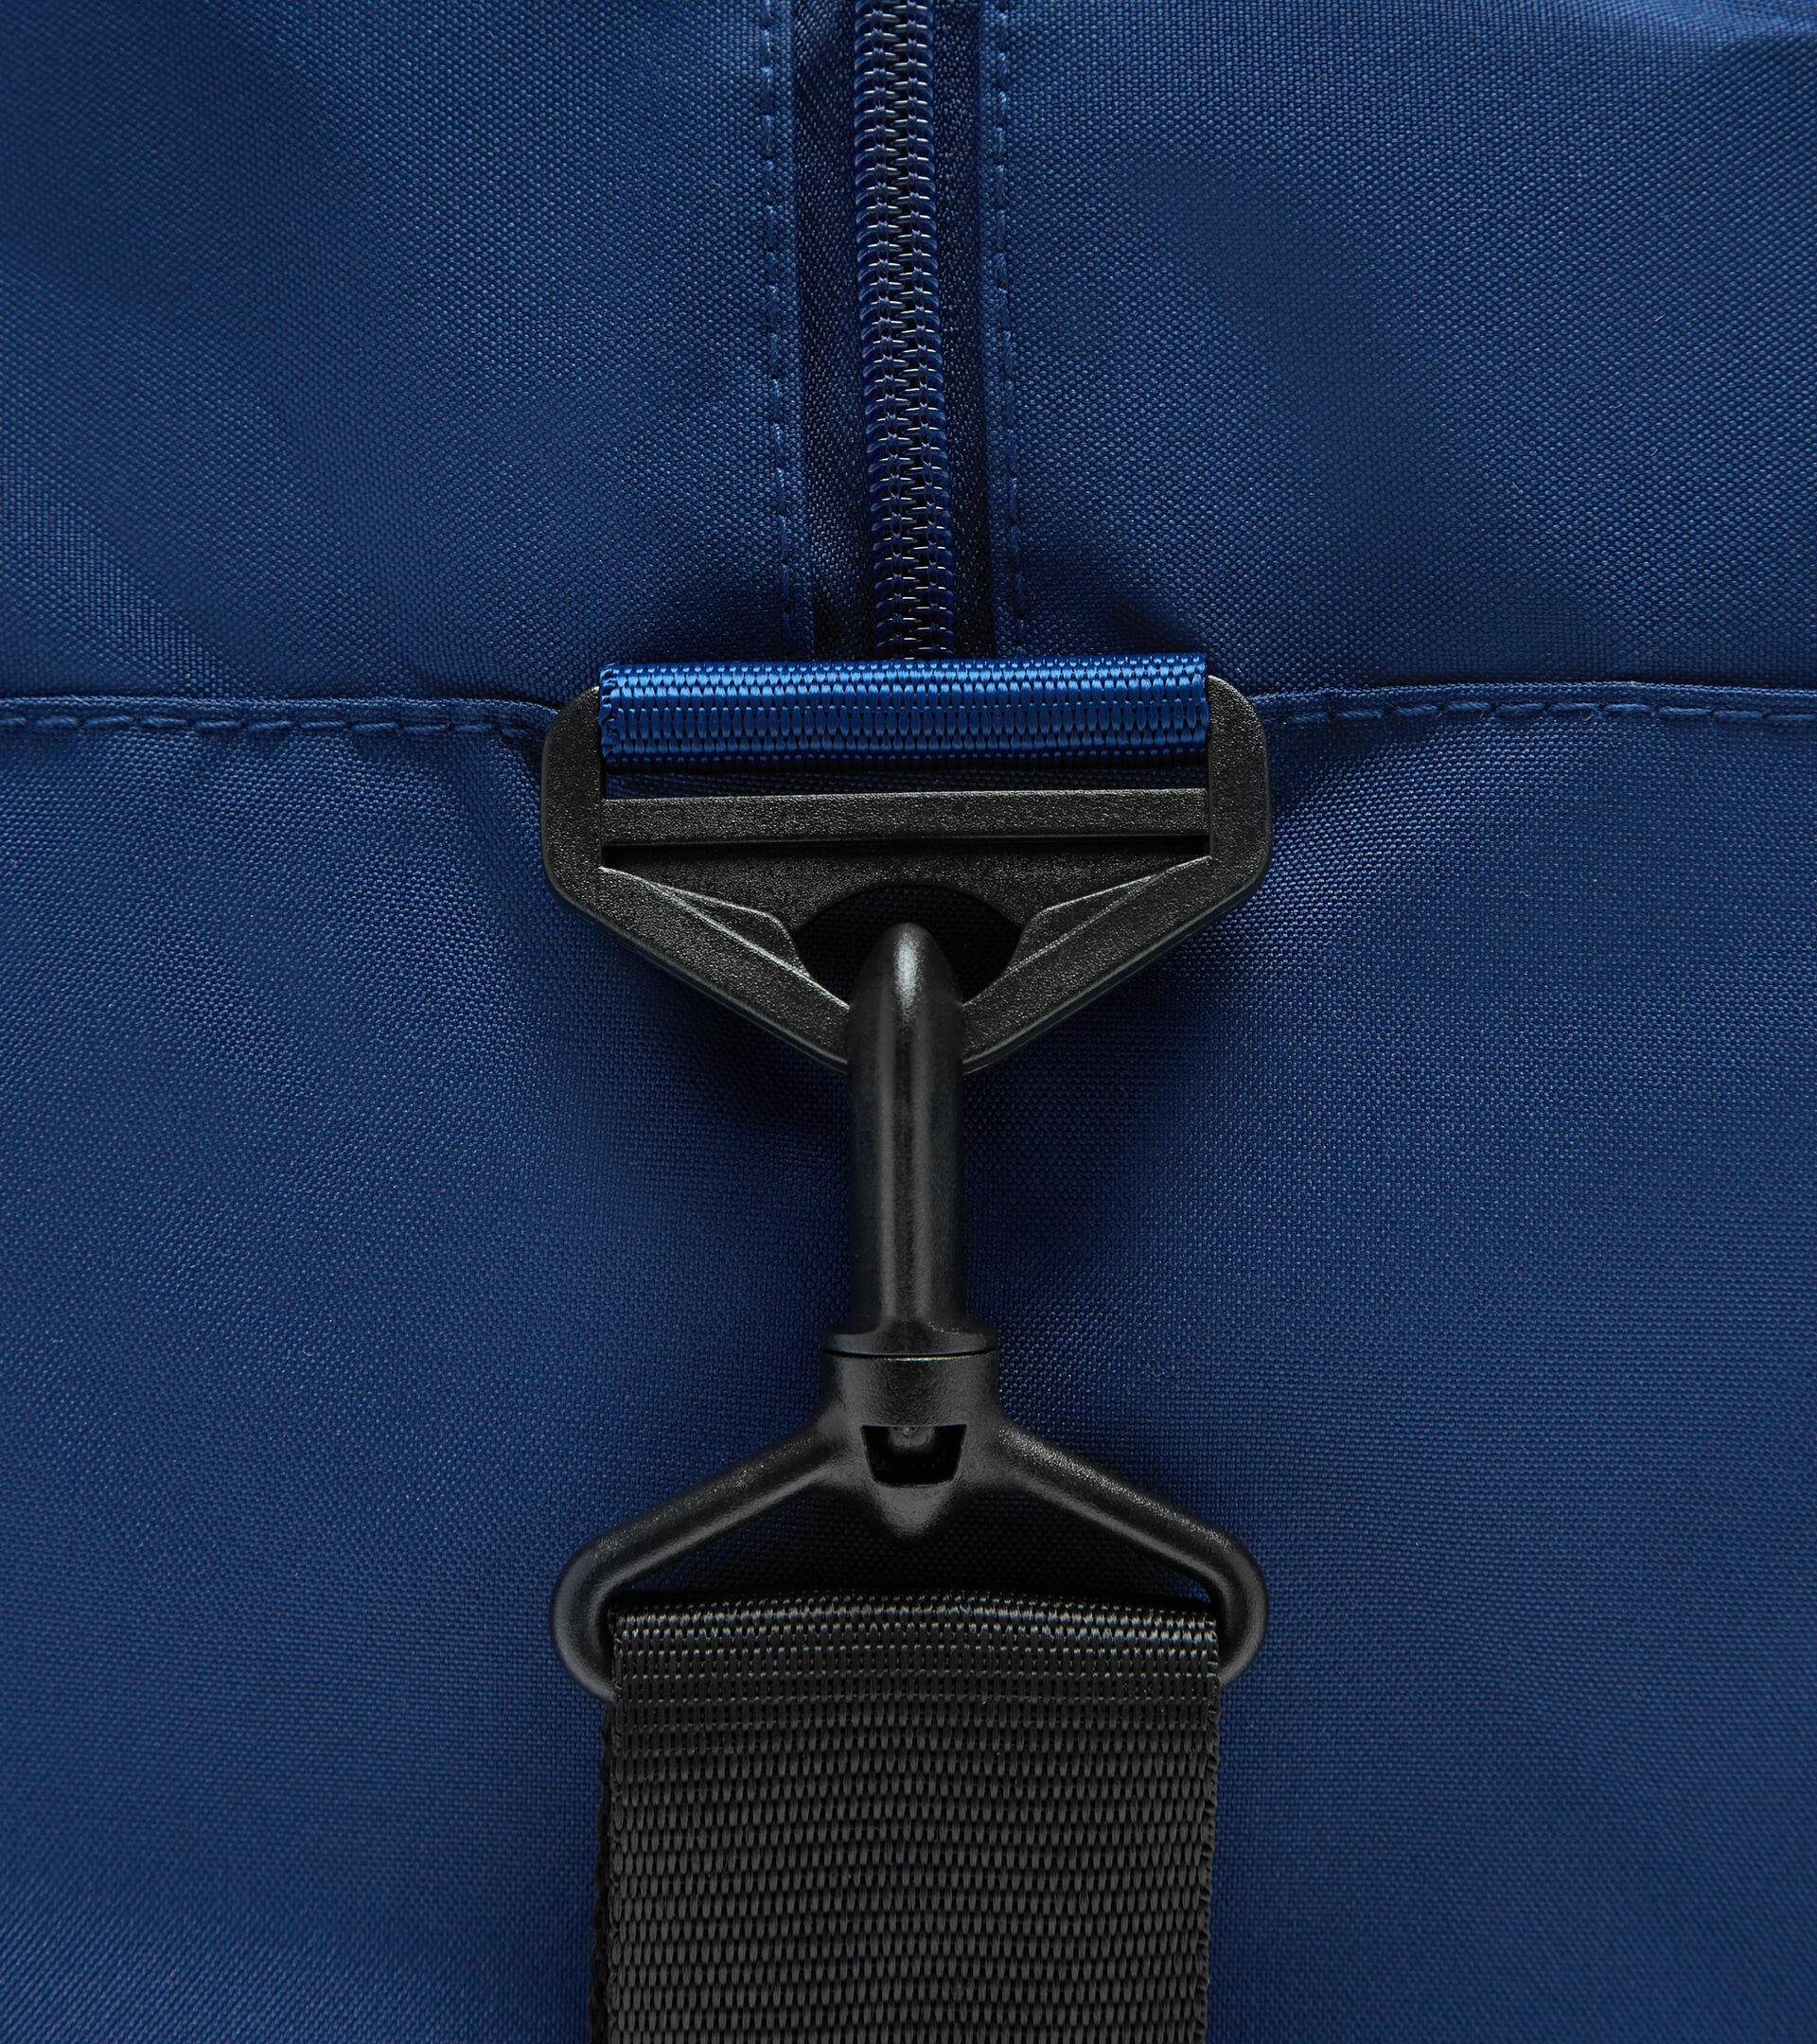 Training bag BAG TENNIS SALTIRE NAVY - Diadora